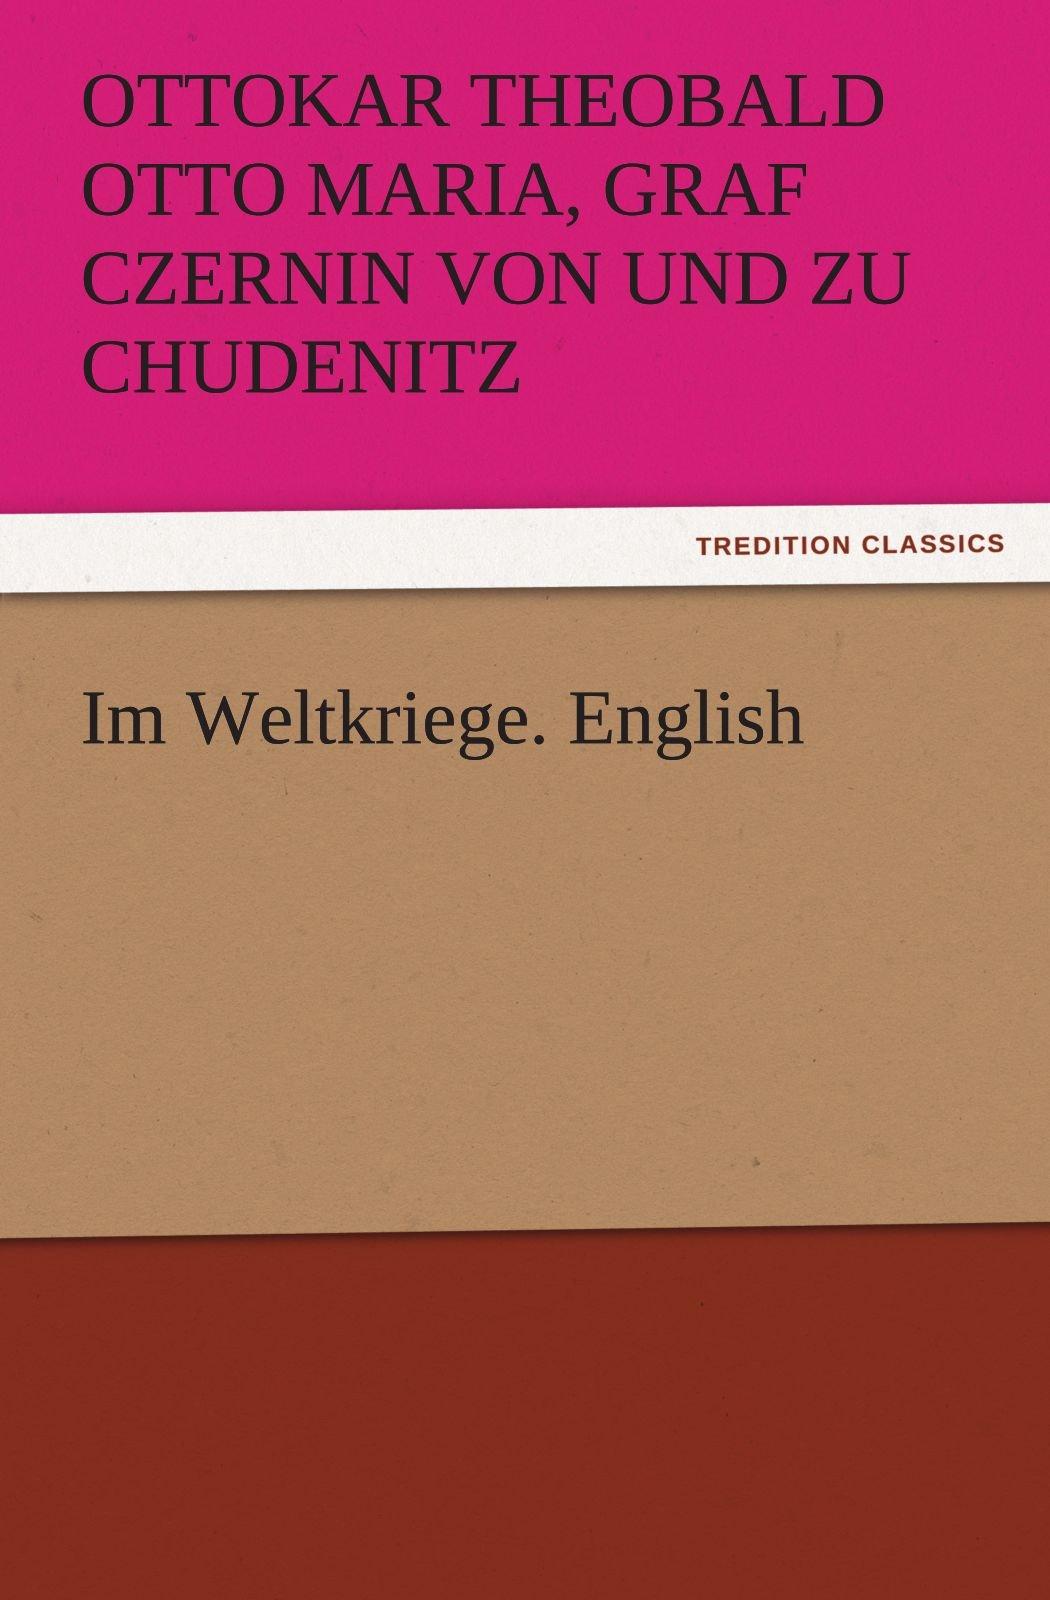 Im Weltkriege. English (TREDITION CLASSICS) pdf epub